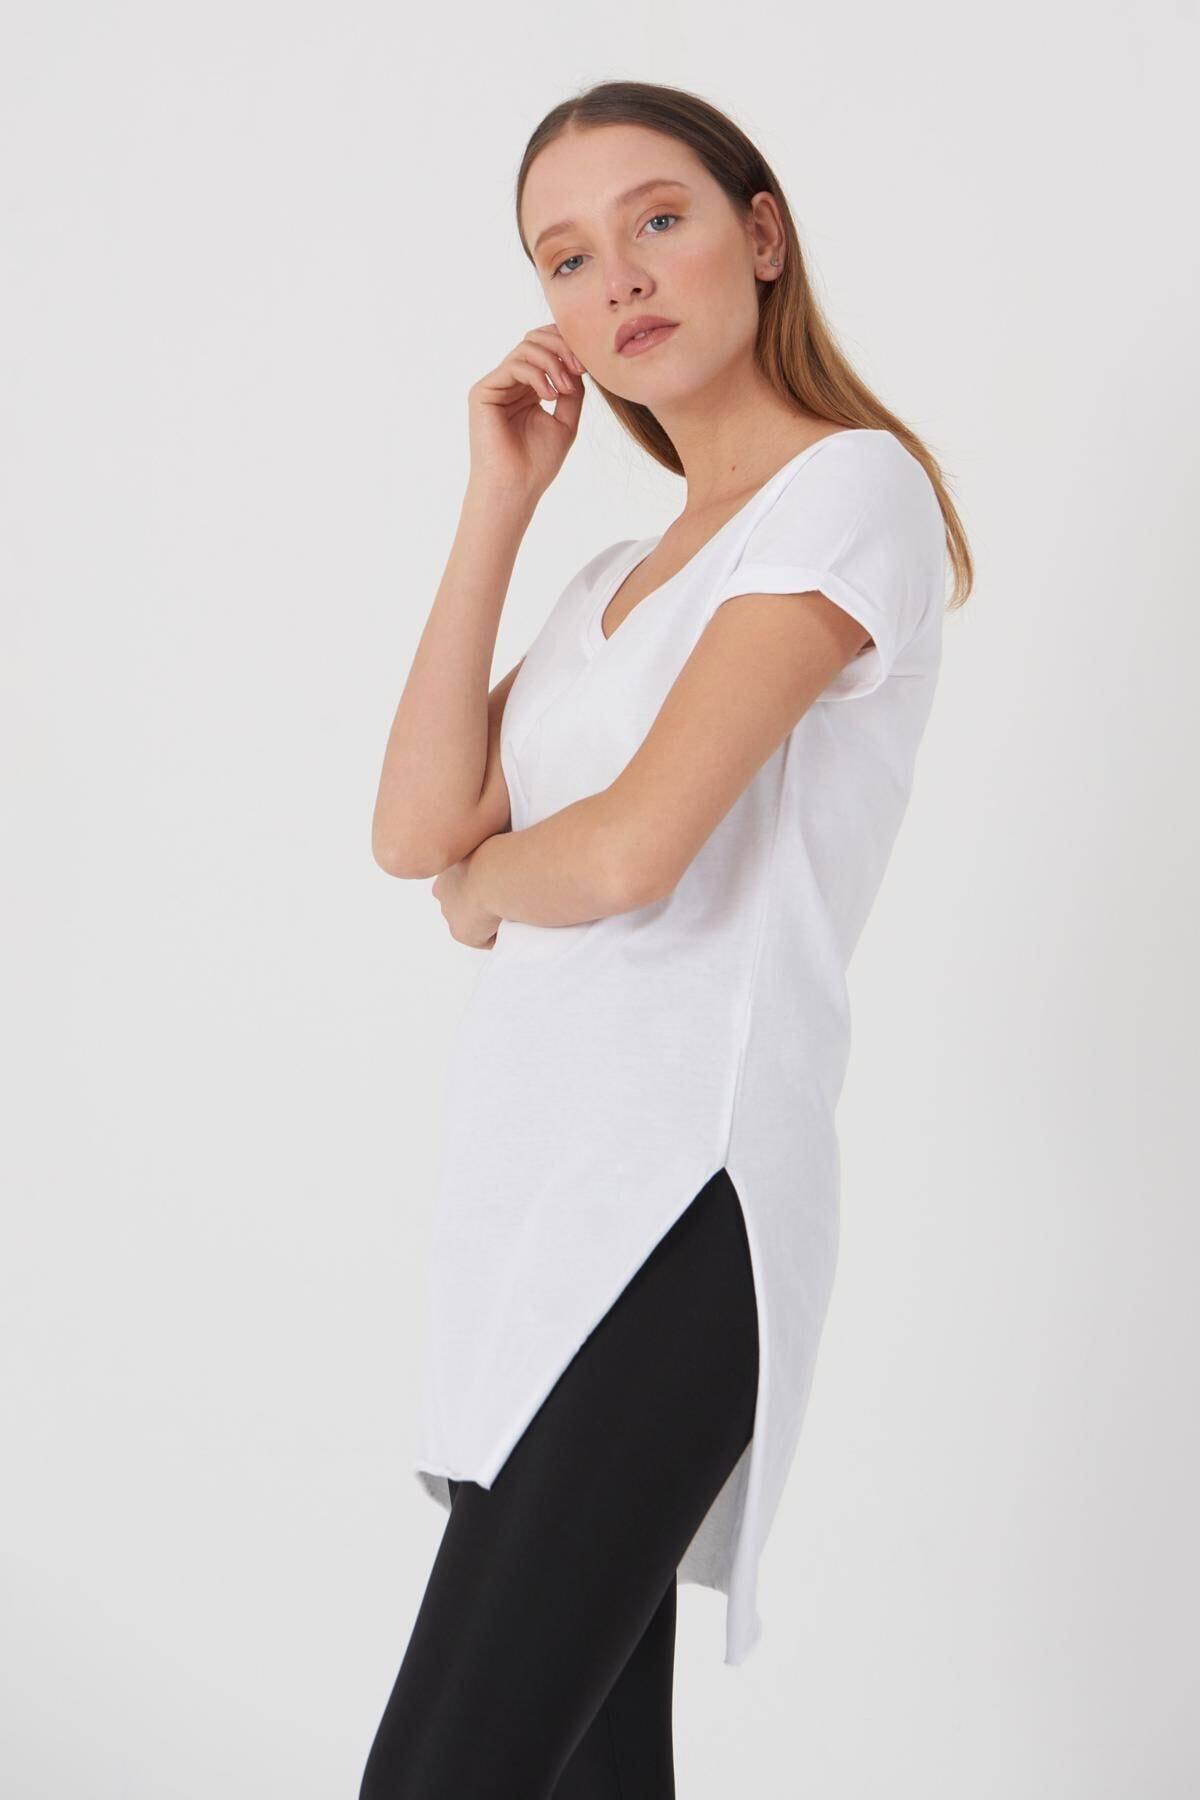 Addax Kadın Beyaz V Yaka T-Shirt P0102 - U1 Adx-00007205 1